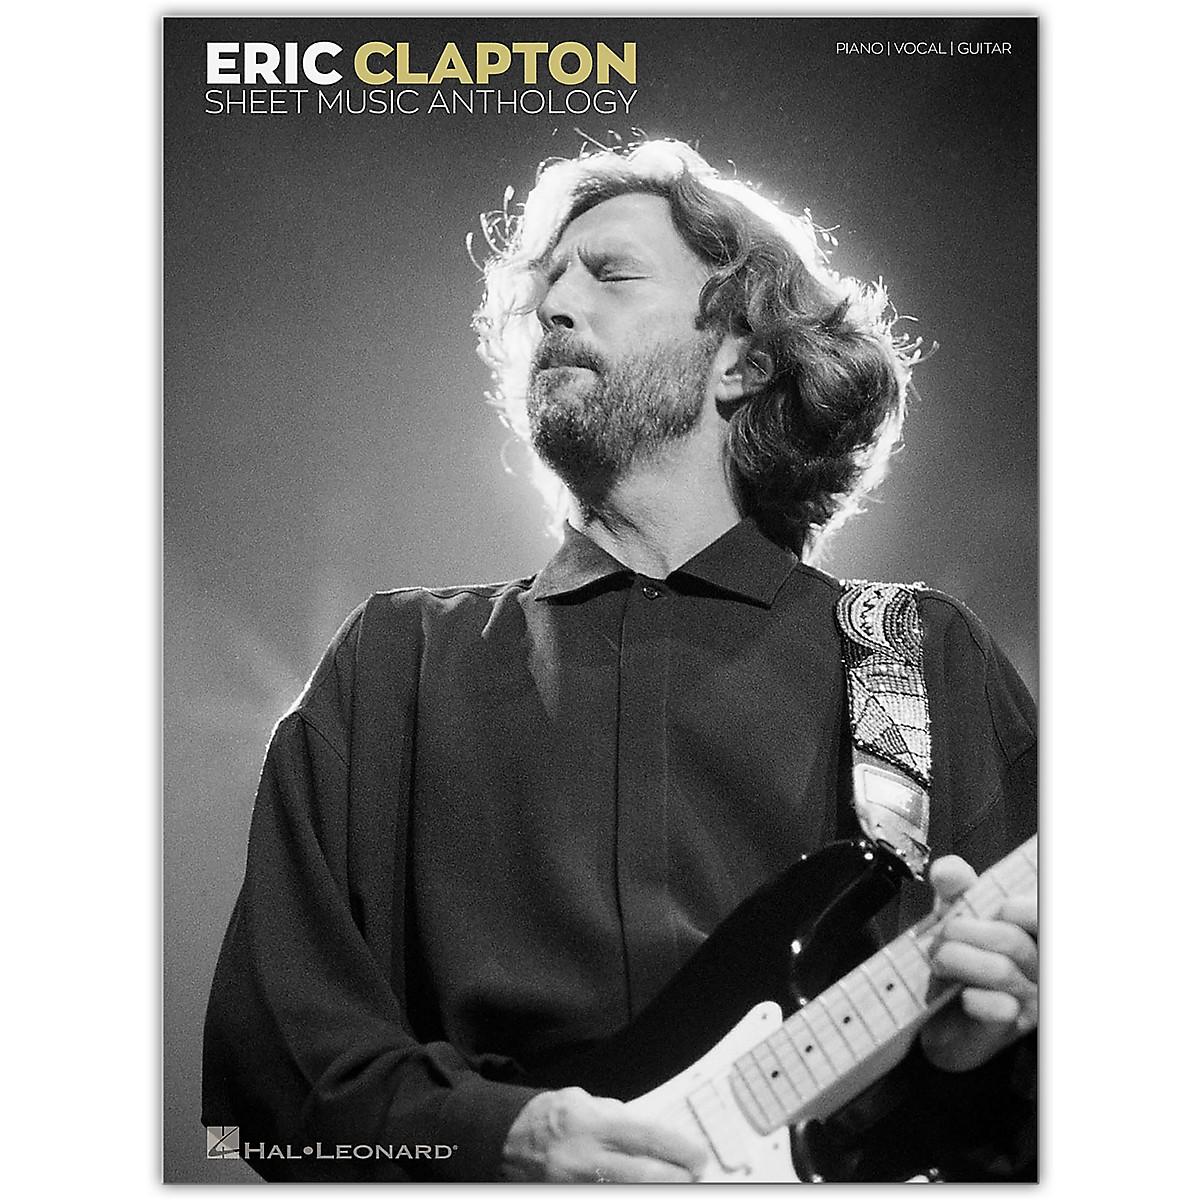 Hal Leonard Eric Clapton Sheet Music Anthology Piano/Vocal/Guitar Songbook